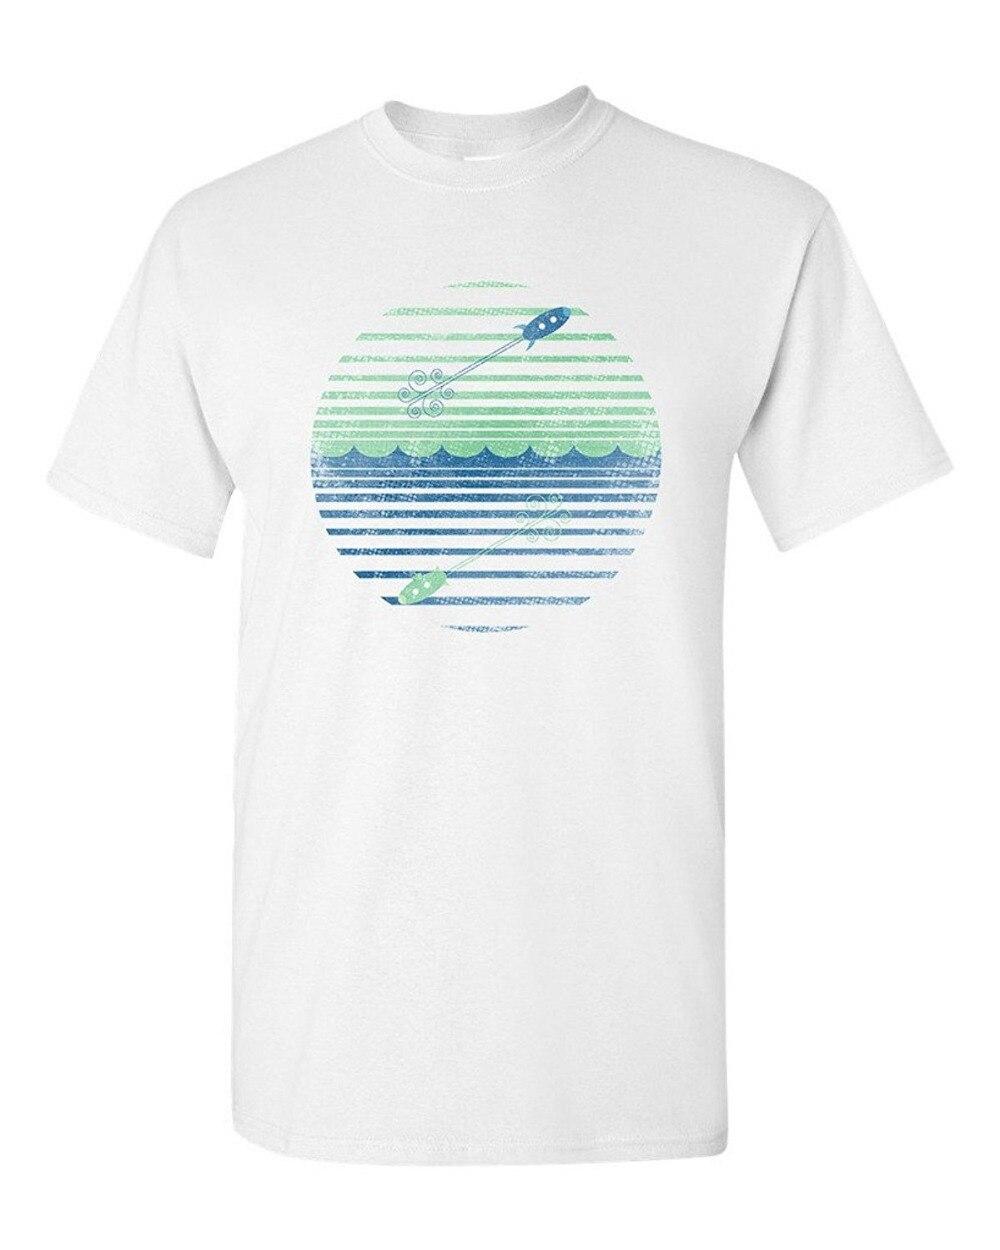 T Shirt Shop Crew Neck Short-Sleeve Fashion 2016 Mens Blast Off And Dive Deep Beanepod Artworks Art Tee Shirts